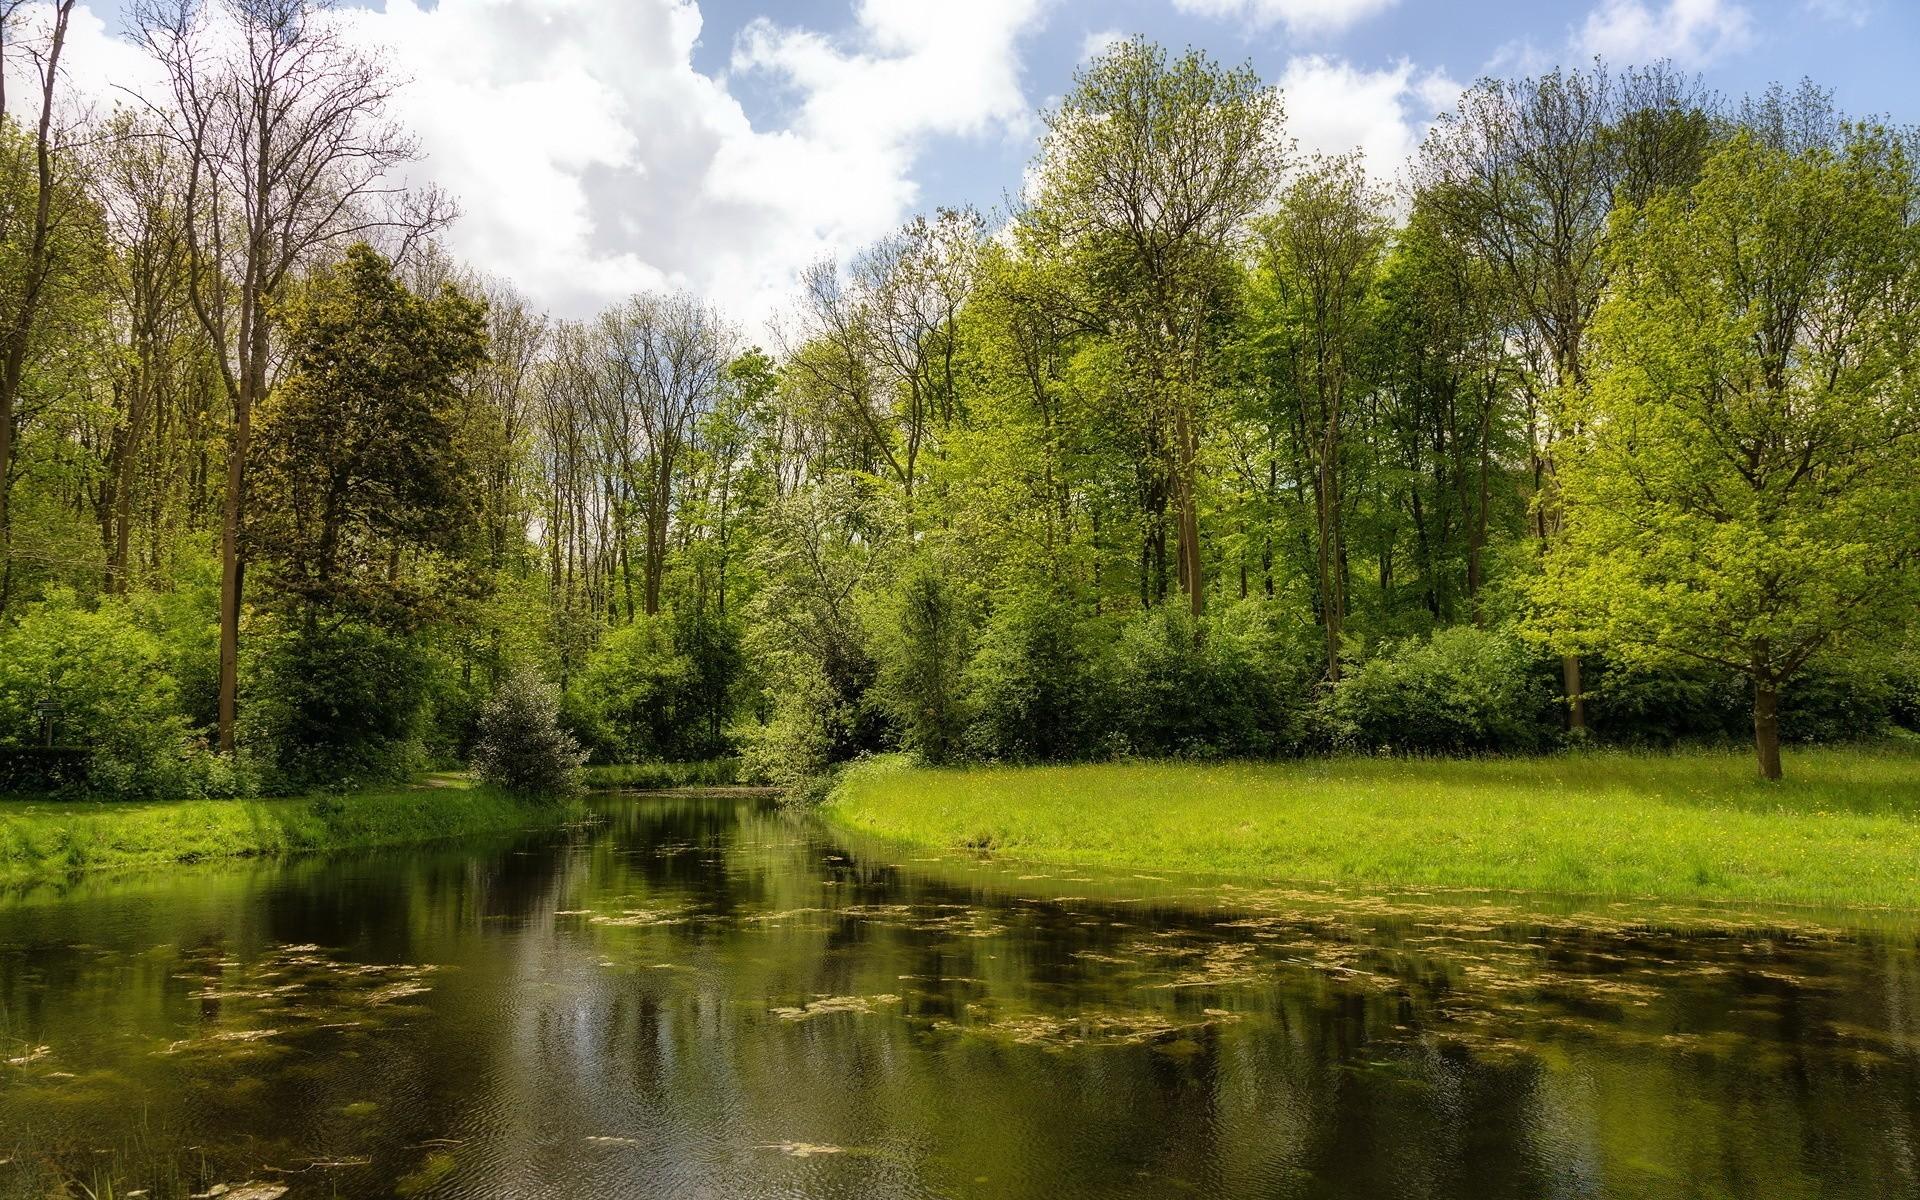 природа деревья небо река дома  № 571439 бесплатно